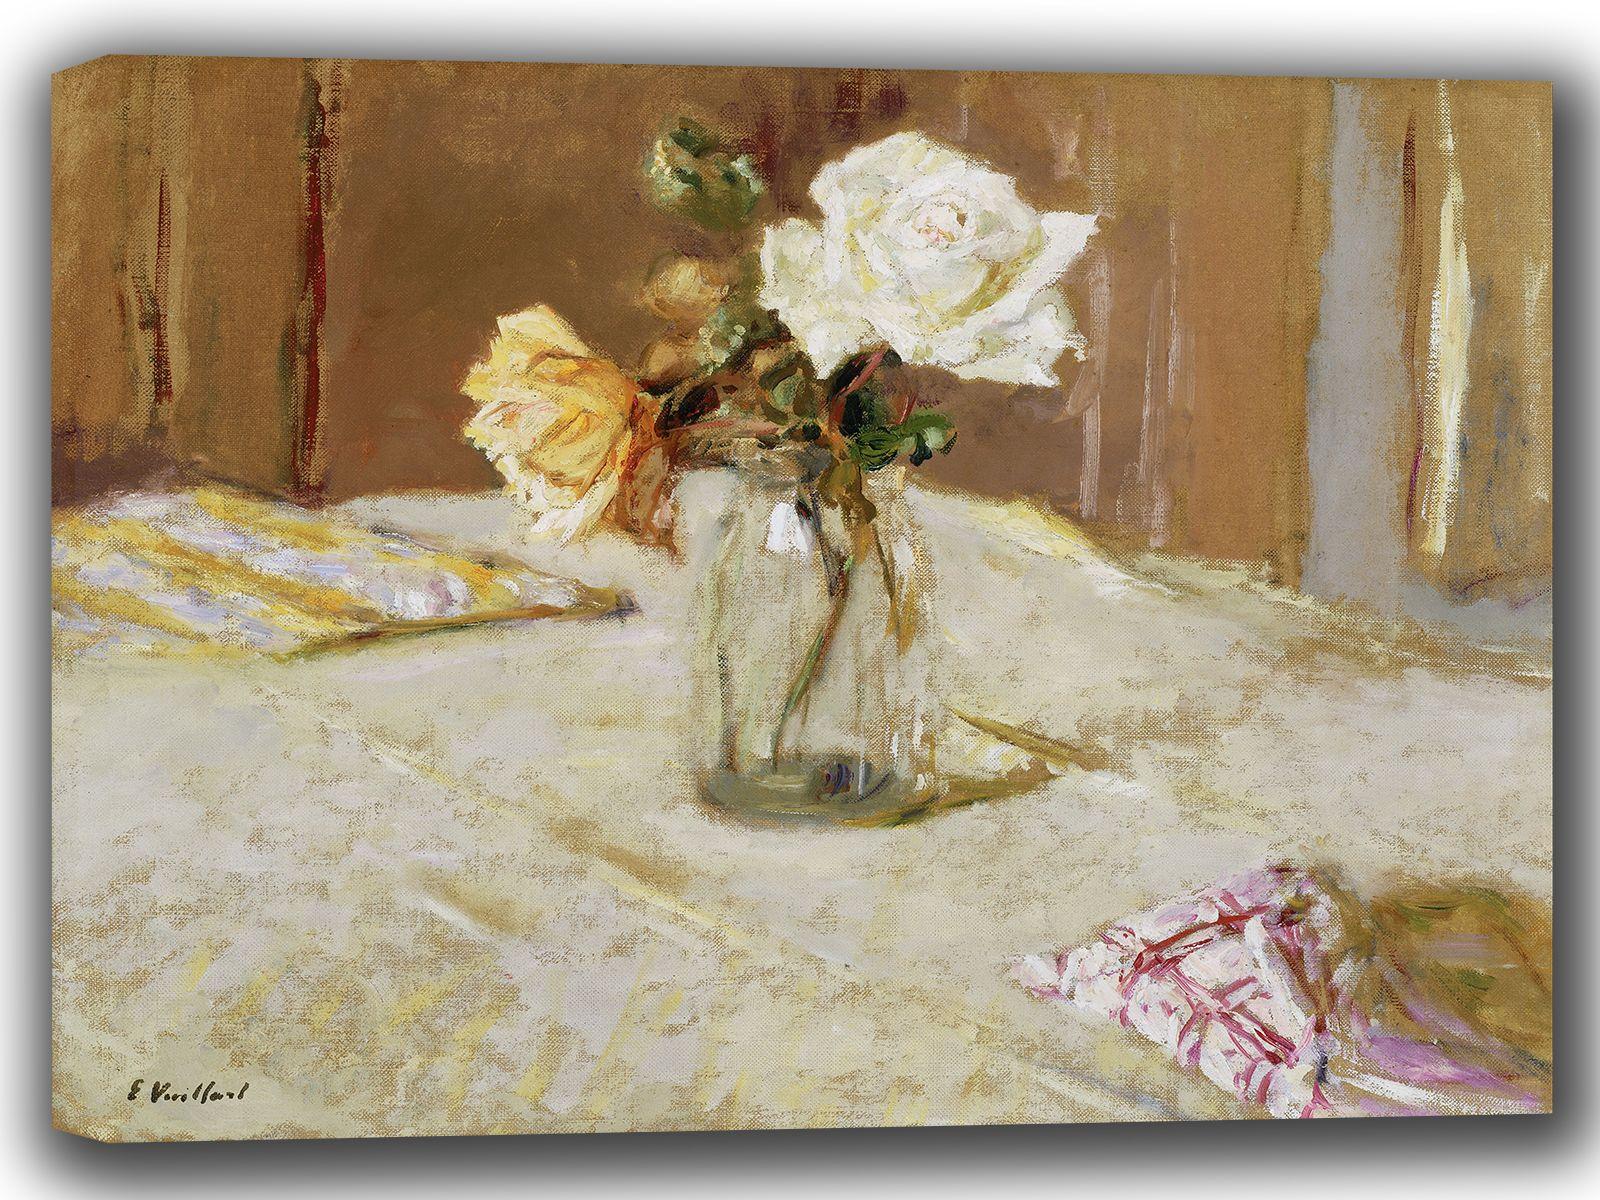 Vuillard, Edouard: Roses in a Glass Vase. Fine Art Canvas. Sizes: A4/A3/A2/A1 (002207)